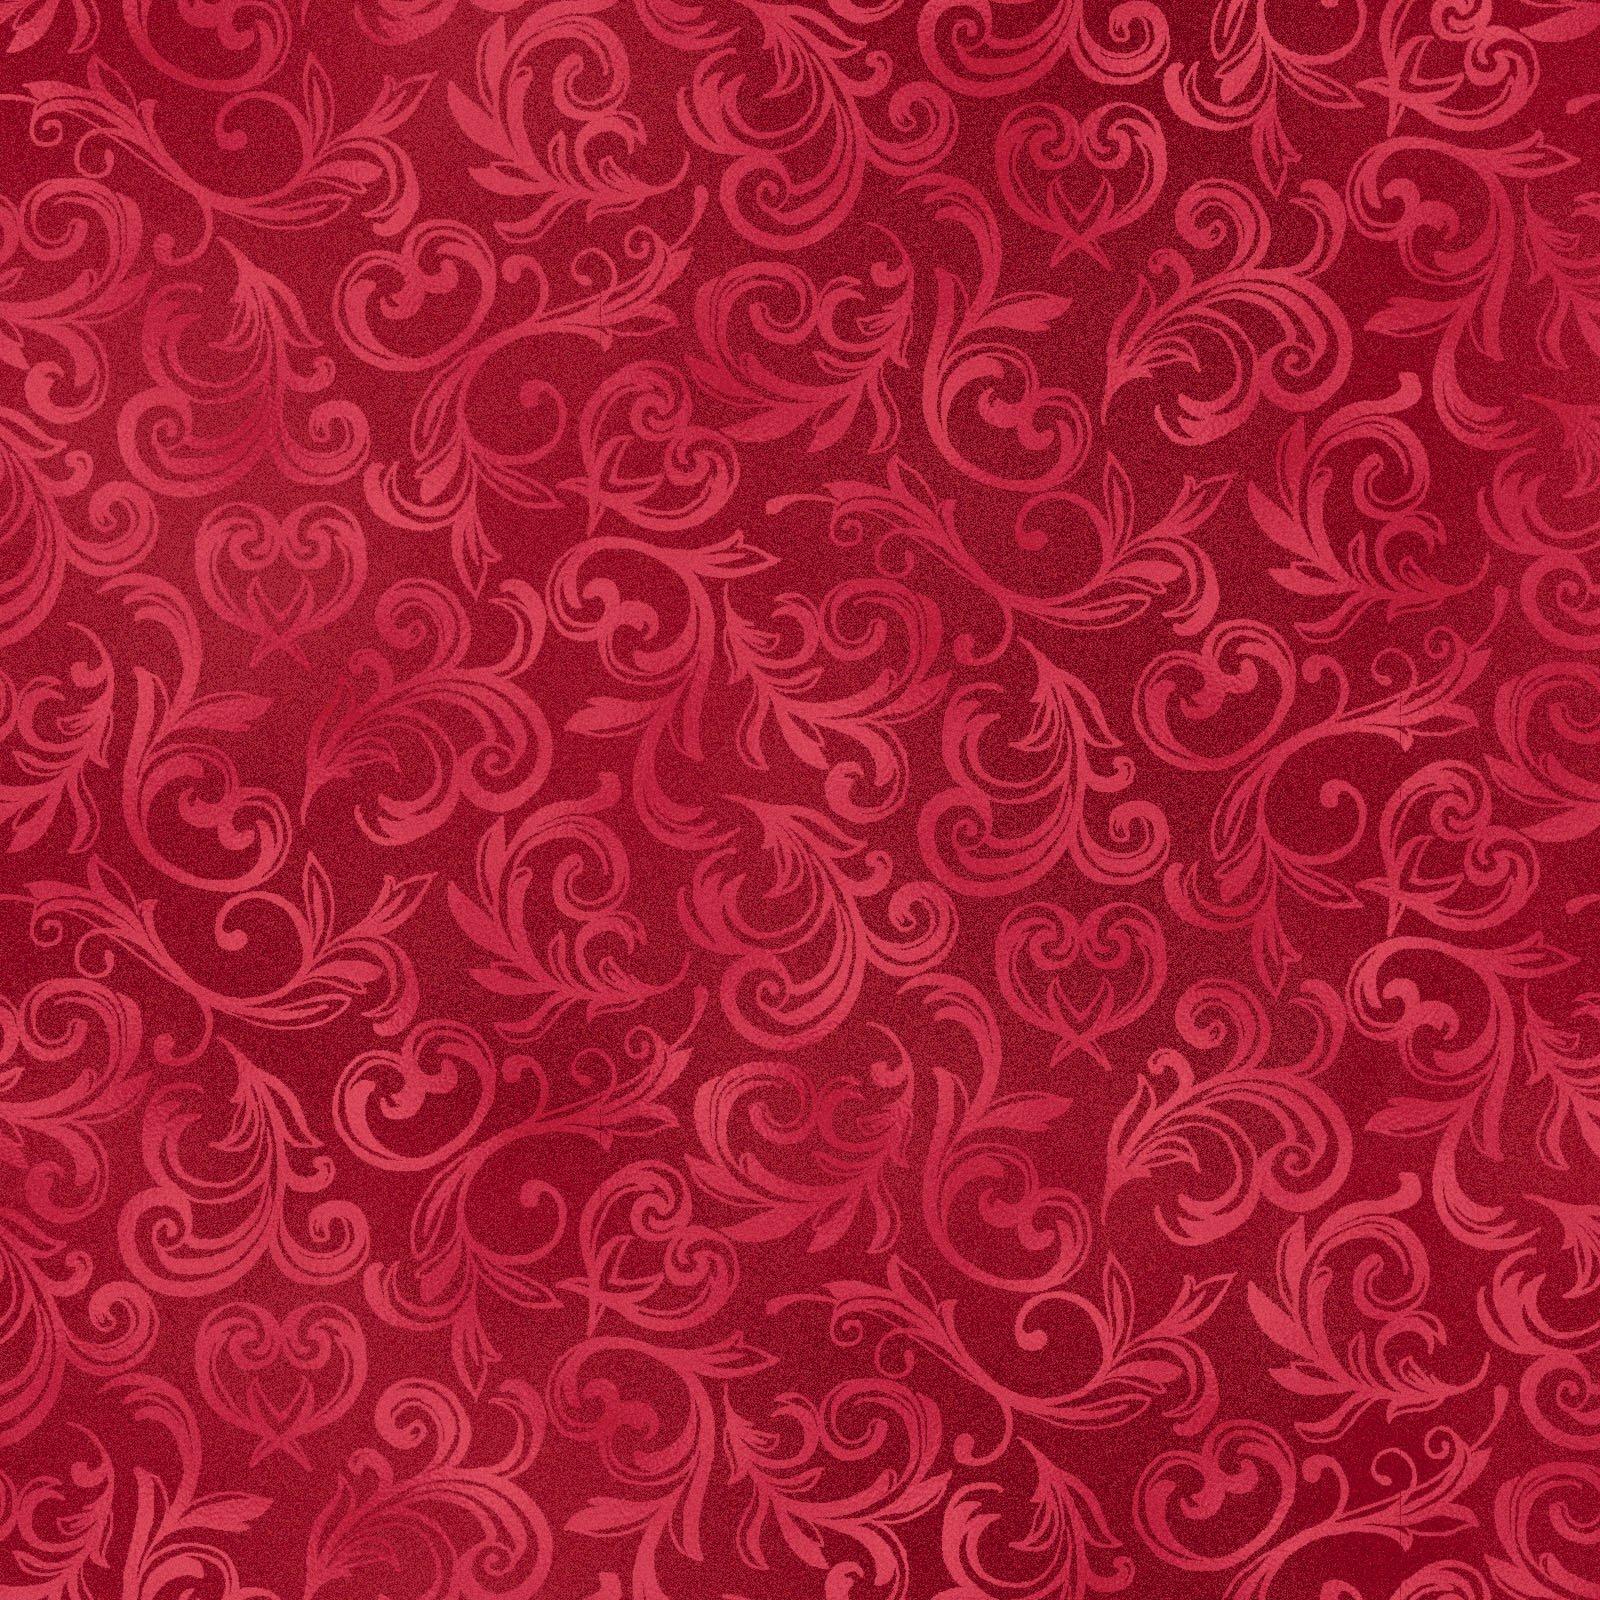 Pearl Essence Scroll Red<br/>Maywood Studio 114-R